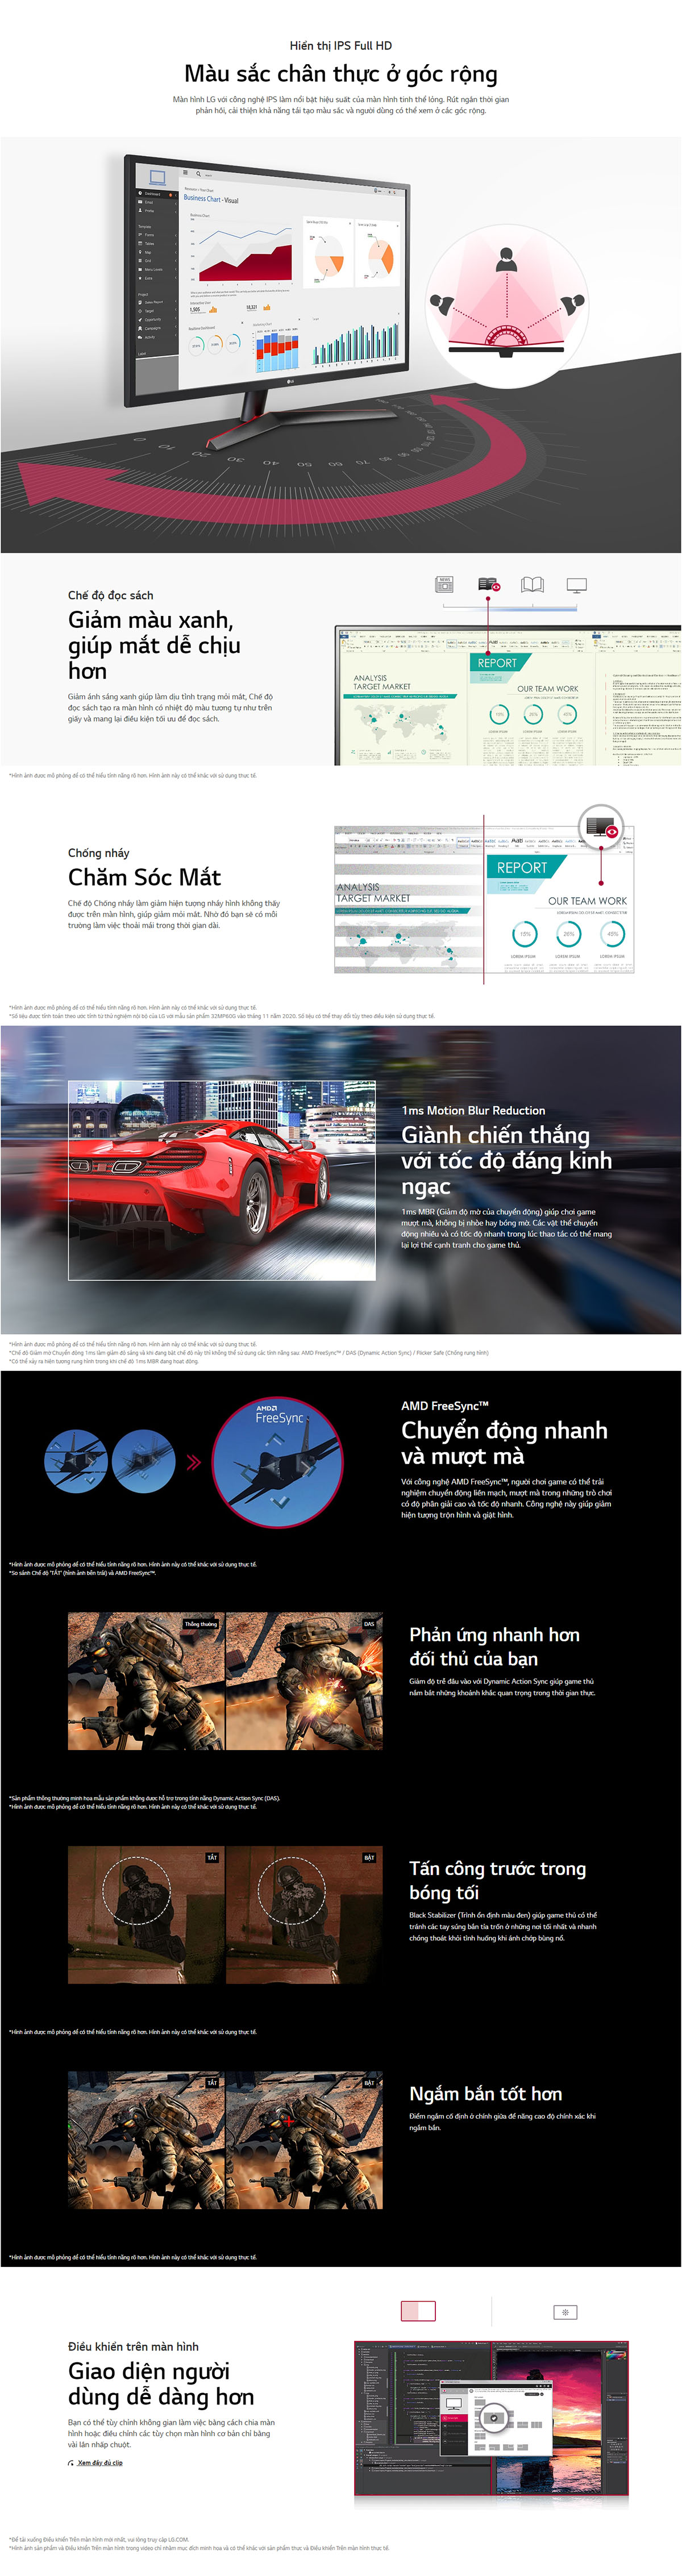 LG 27MP60G B Gaming Monitor Details